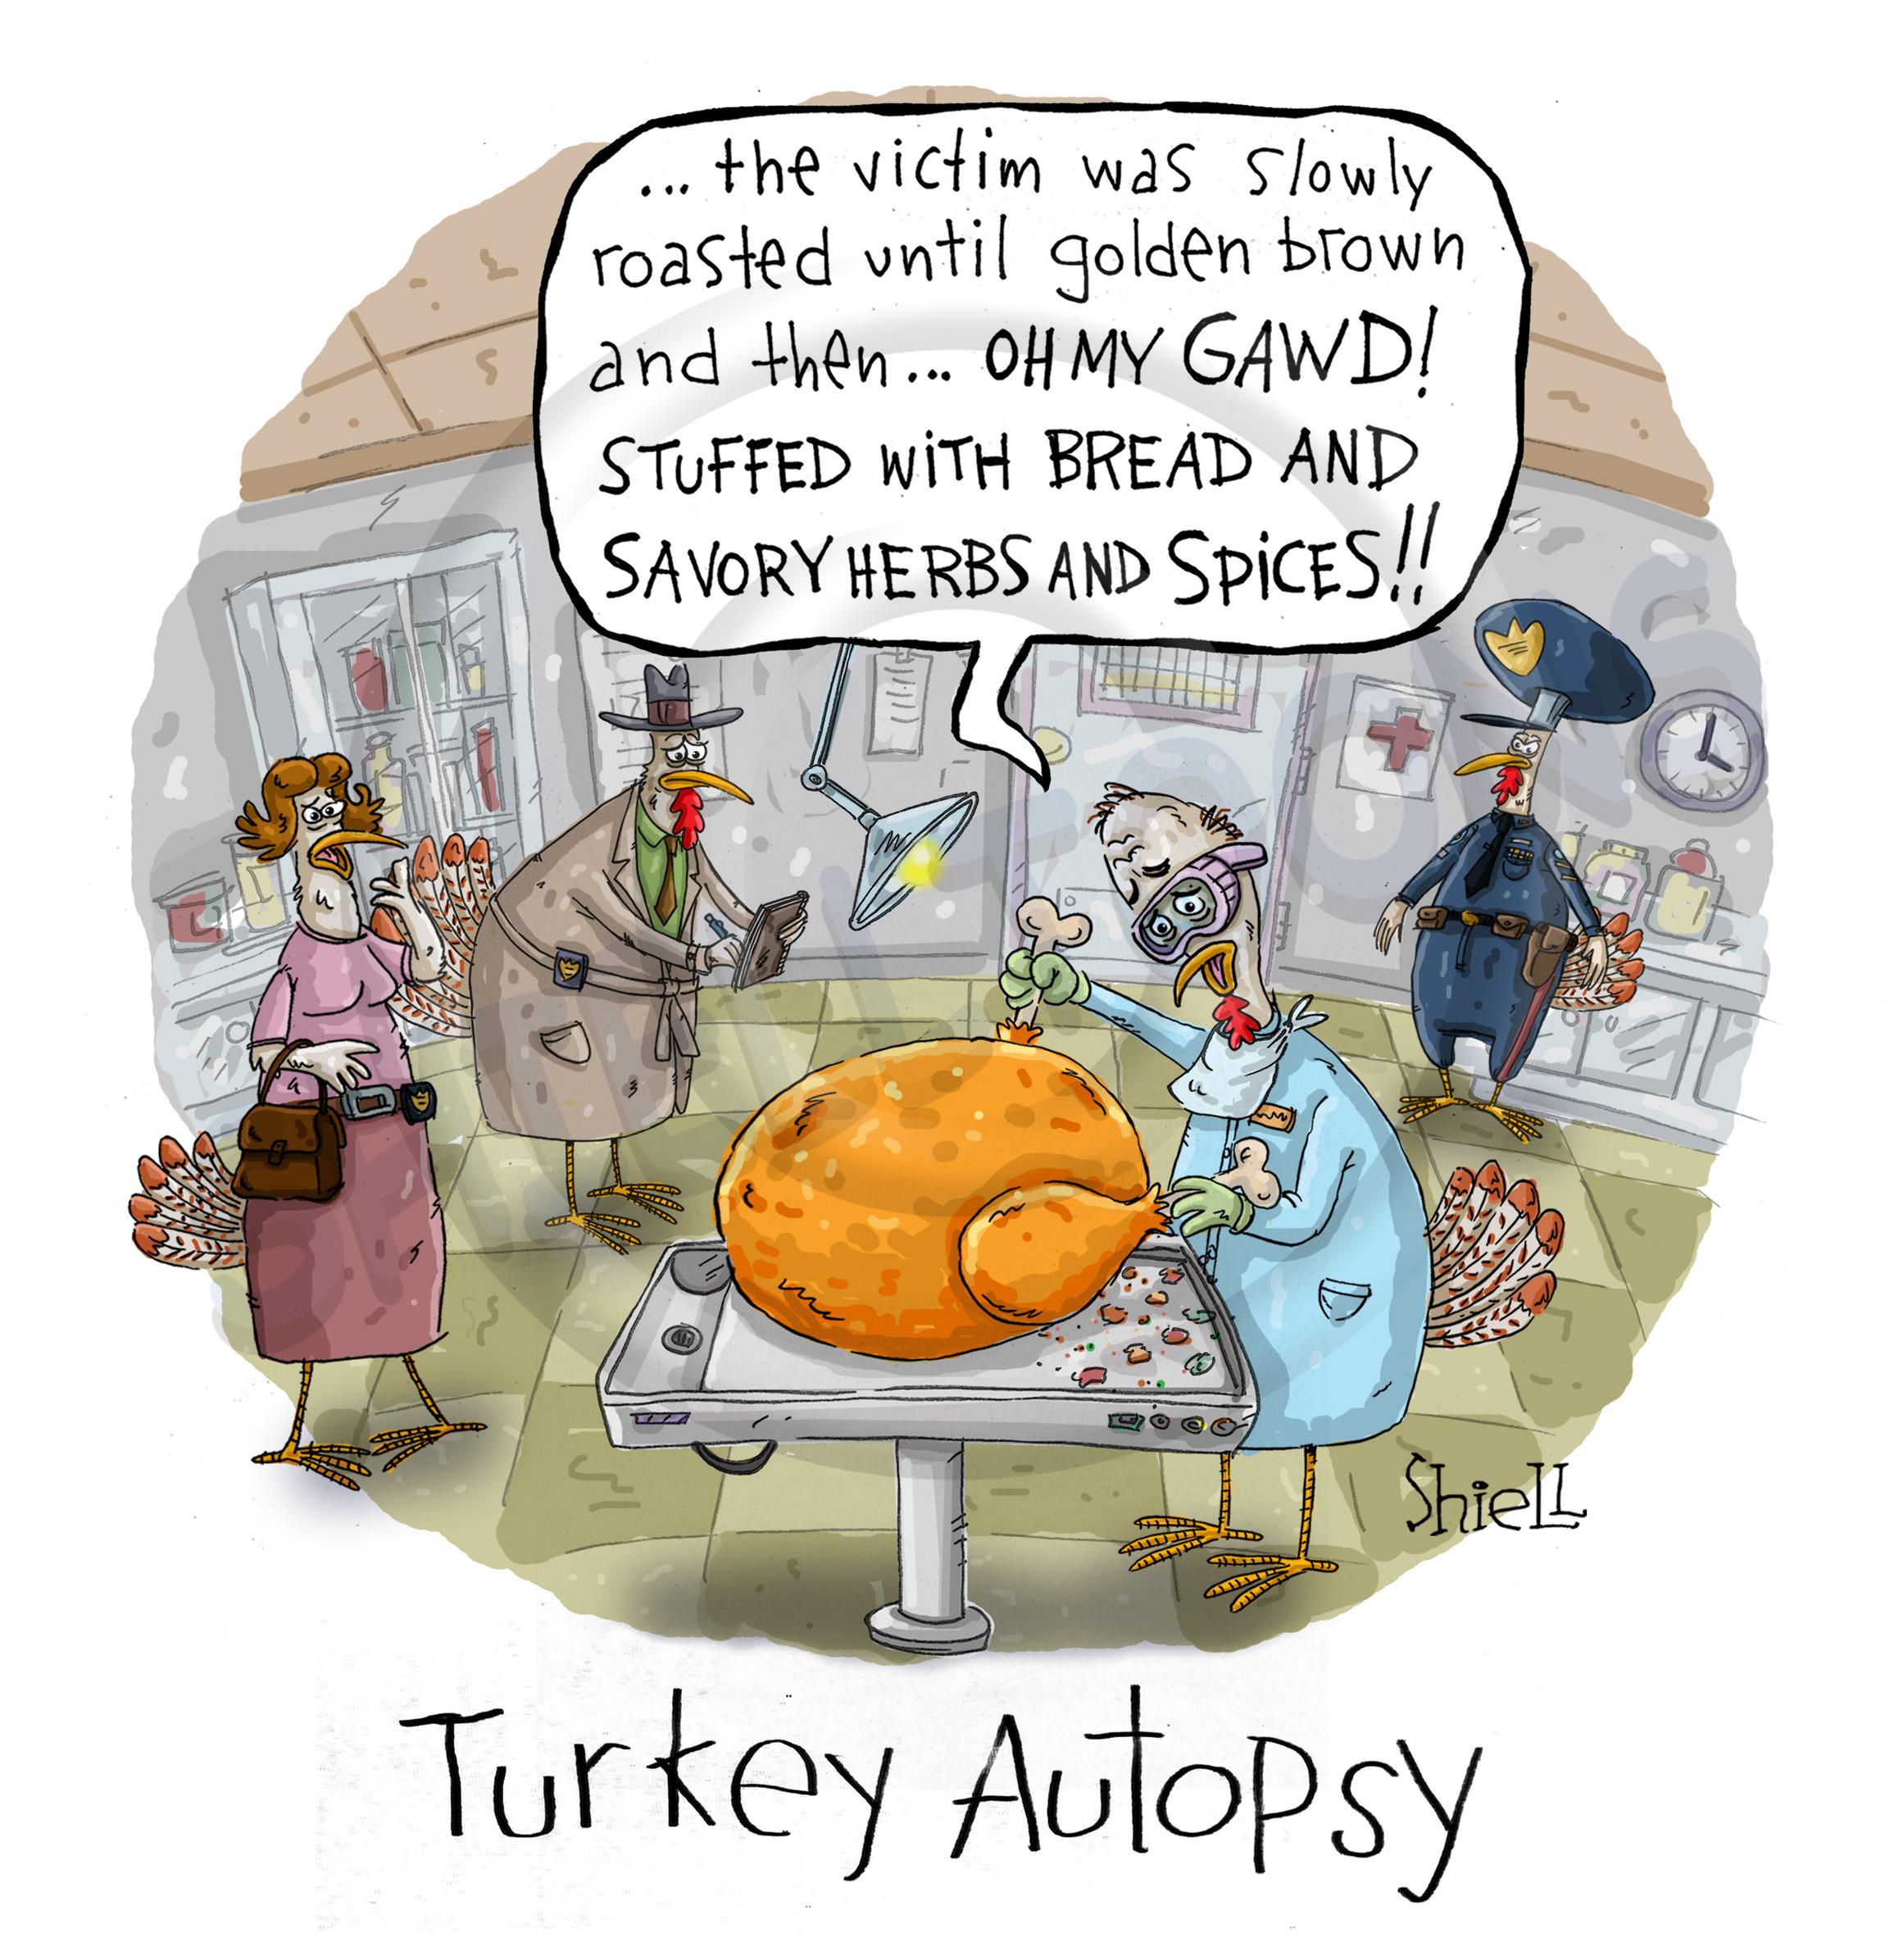 WM_Turkey_Autopsy_Colour_01BW.jpg